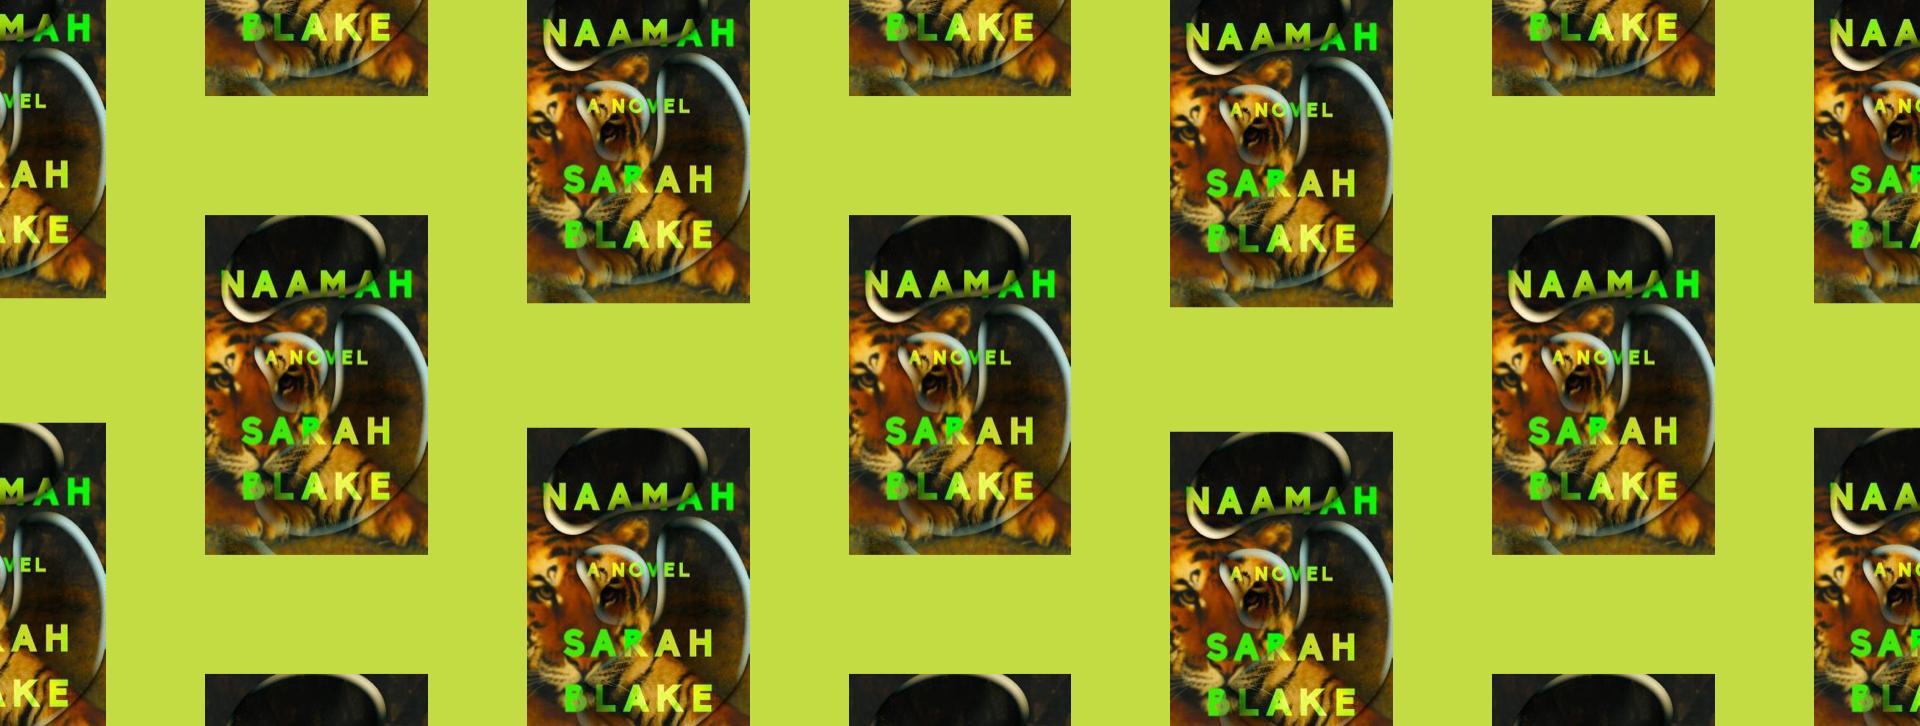 Naamah.png